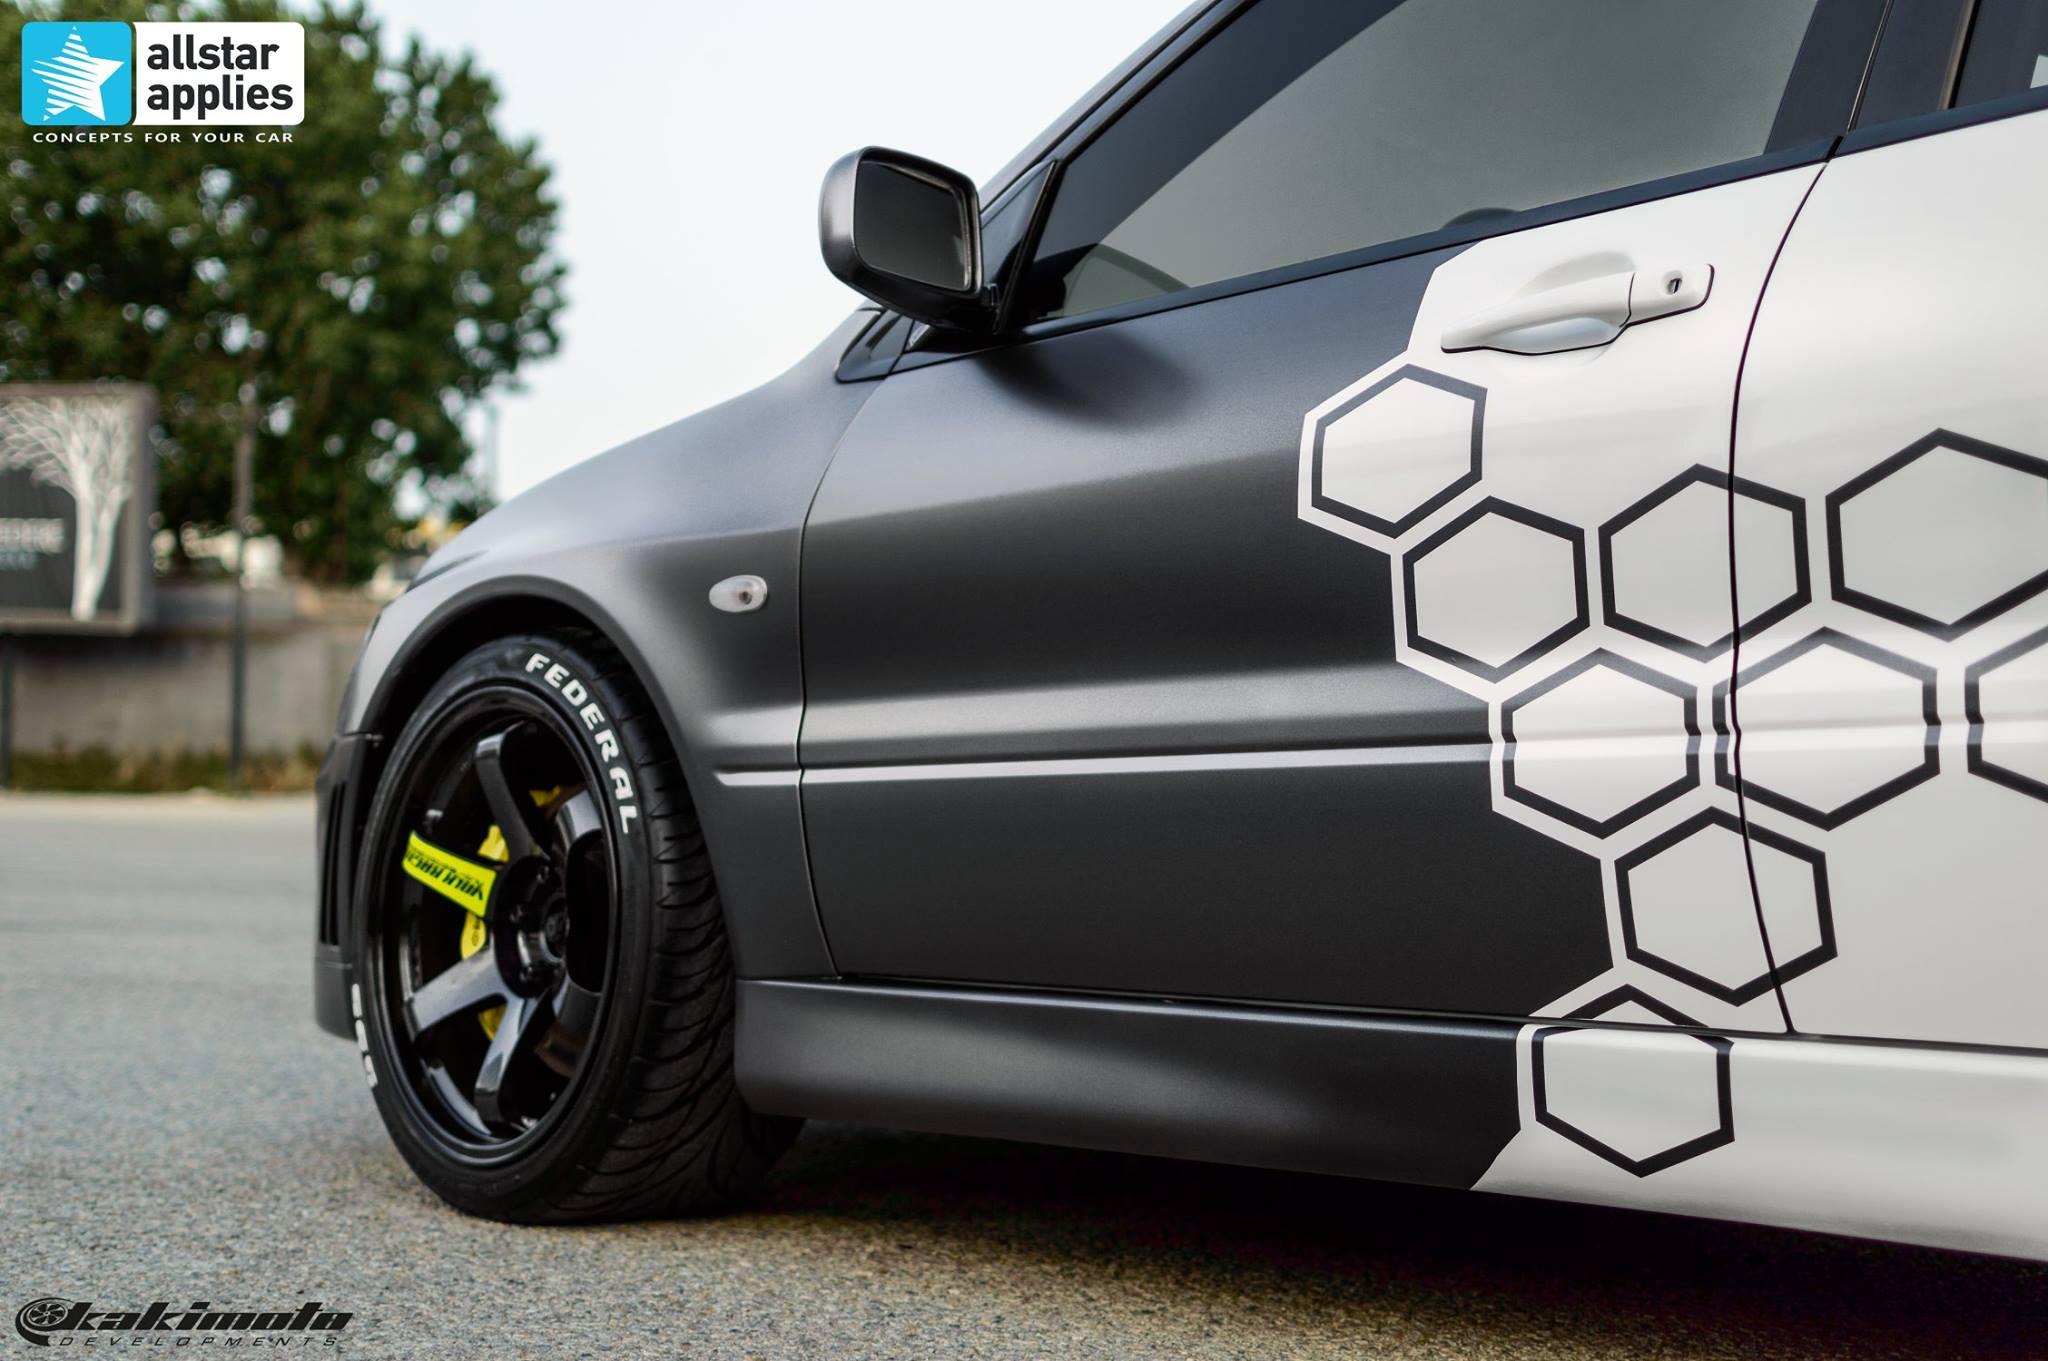 Mitsubishi Evo 7 - Honeycomb Design (9)